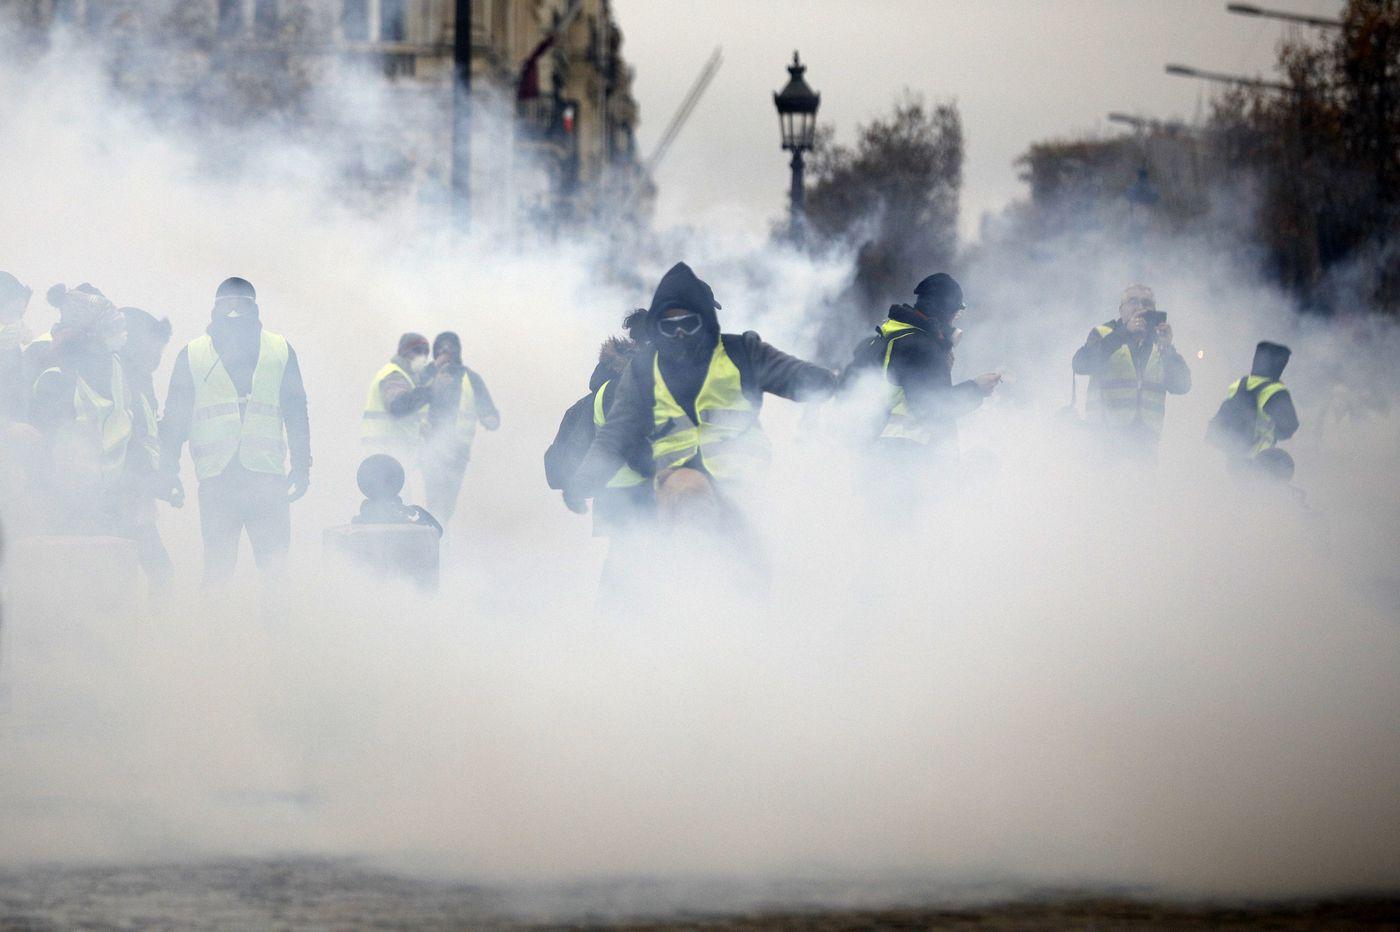 Worst riot in a decade engulfs Paris; Macron vows action